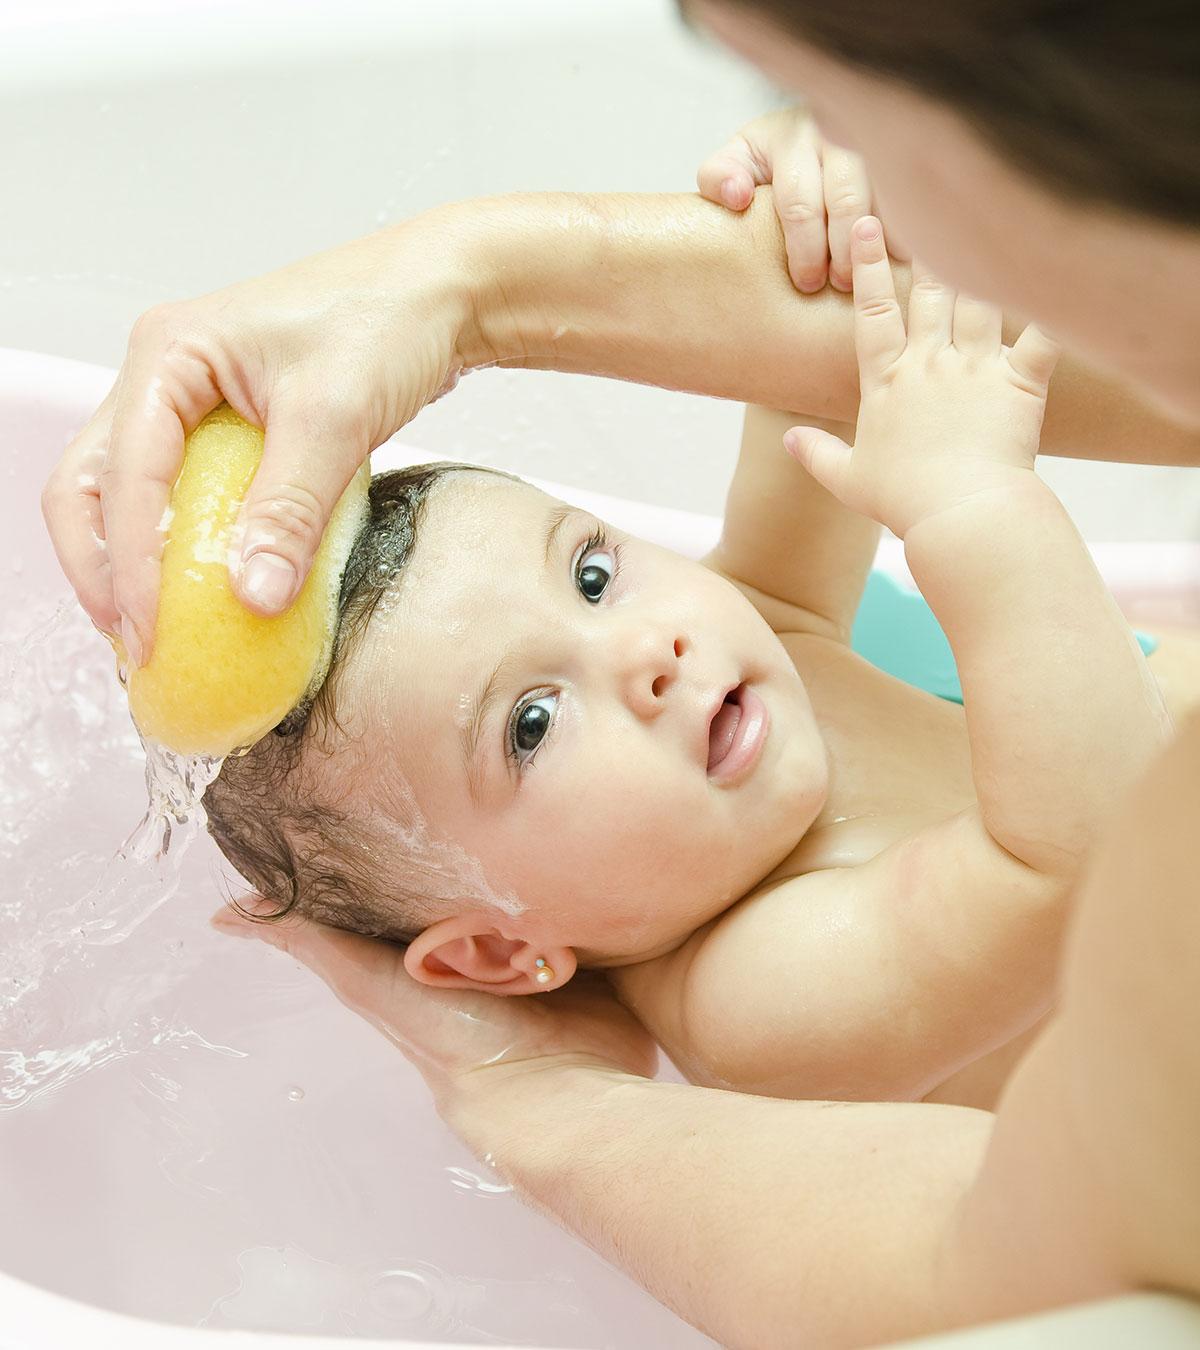 reborn-baby-doll-hair-care-5